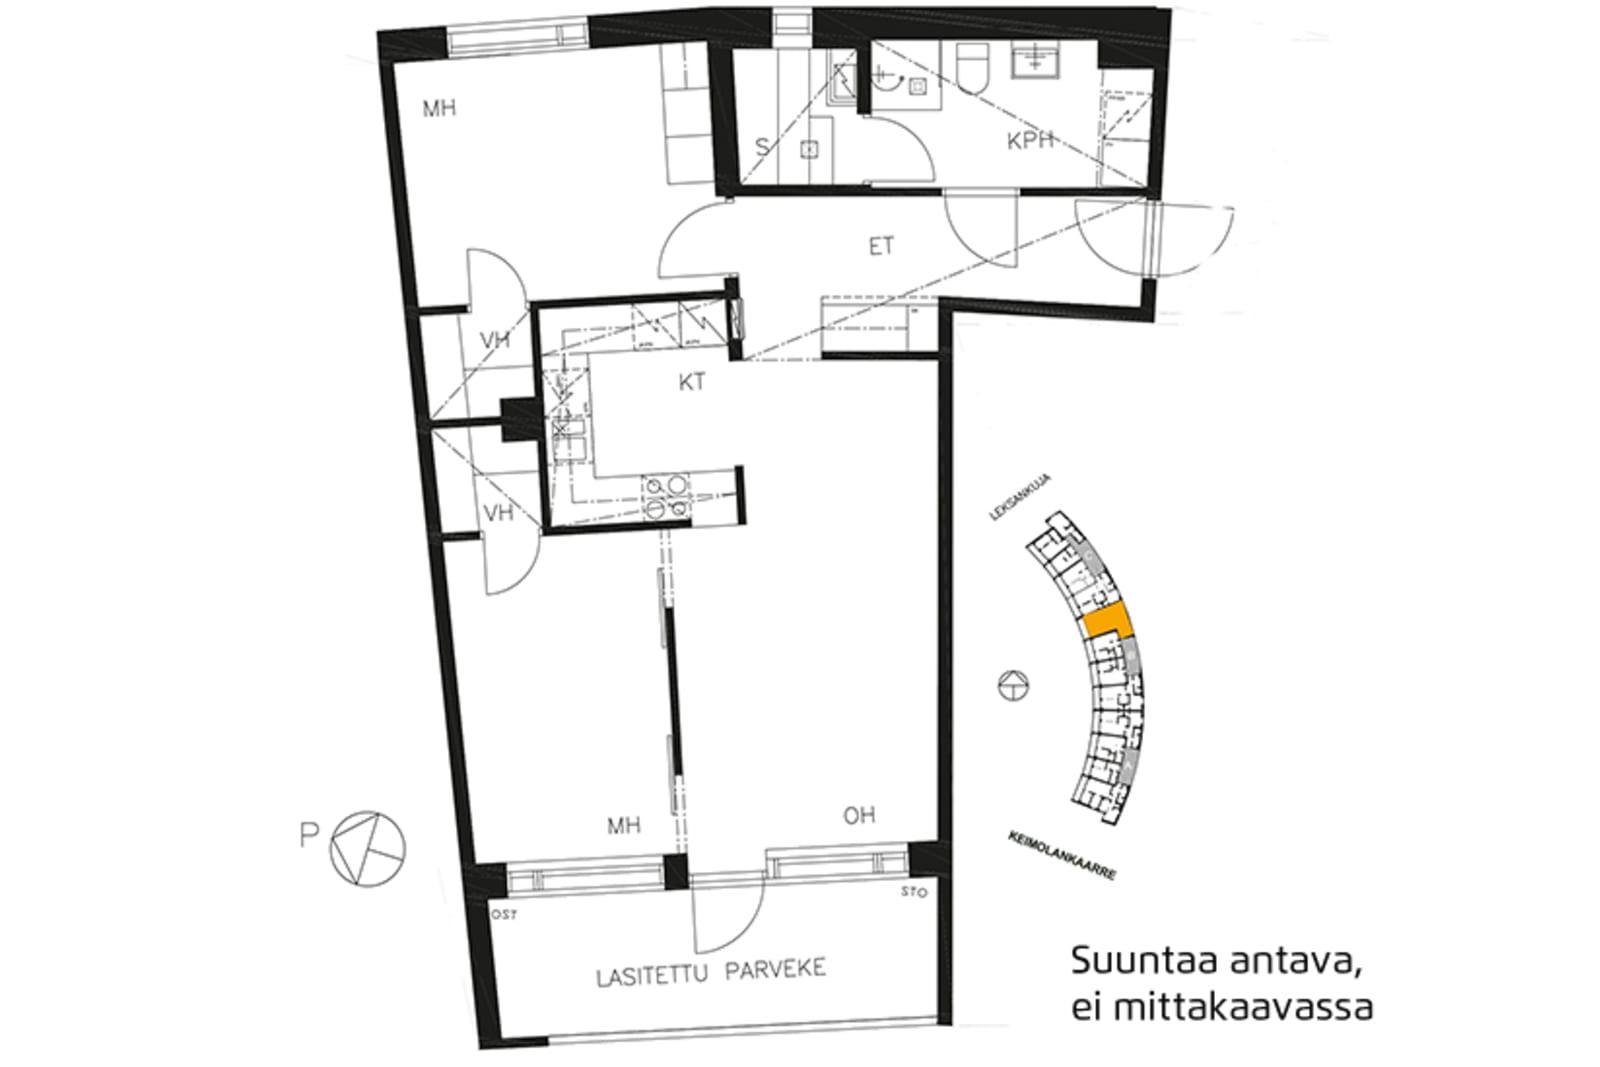 Vantaa, Keimolanmäki, Leksankuja 3 B 033